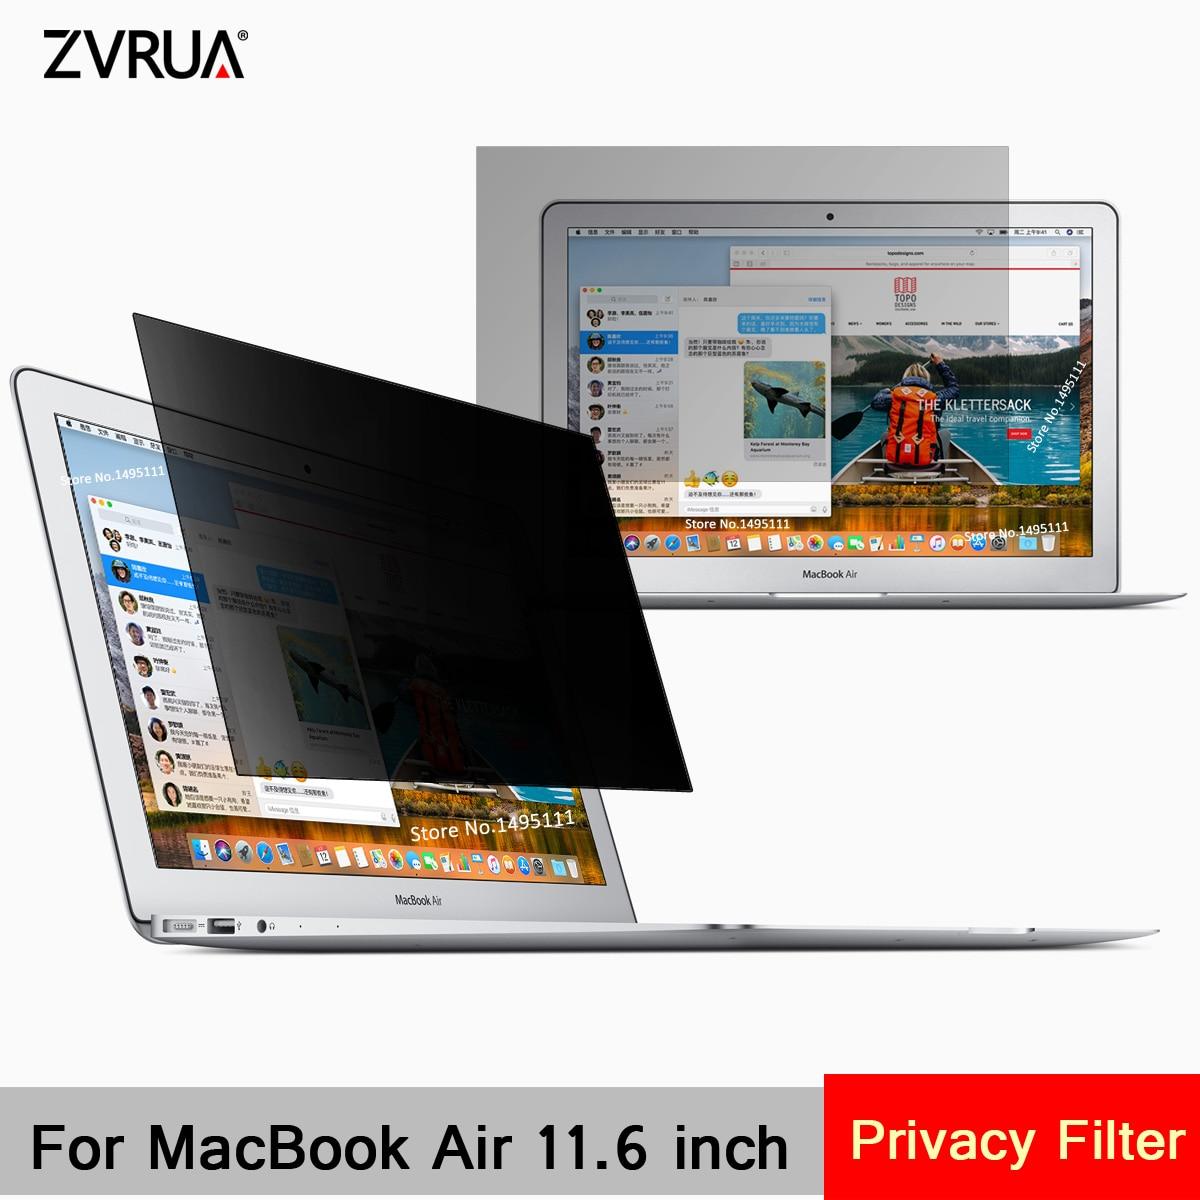 Für Apple MacBook Air 11,6 zoll (256mm * 144mm) privatsphäre Filter Laptop Notebook Anti-glare Screen protector Schutz film